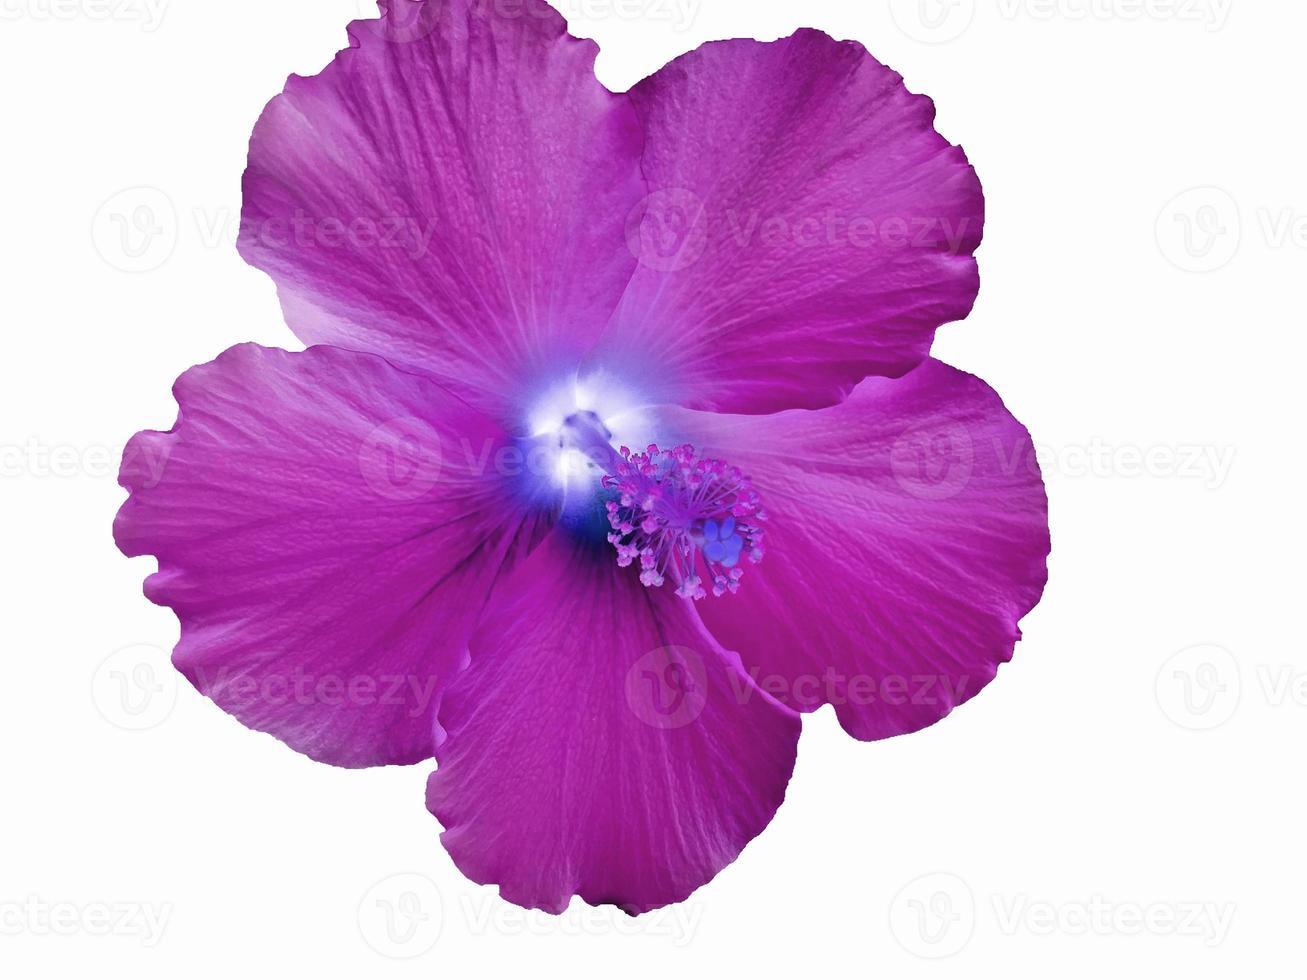 bunte magenta hawaiianische Hibiskusblume foto